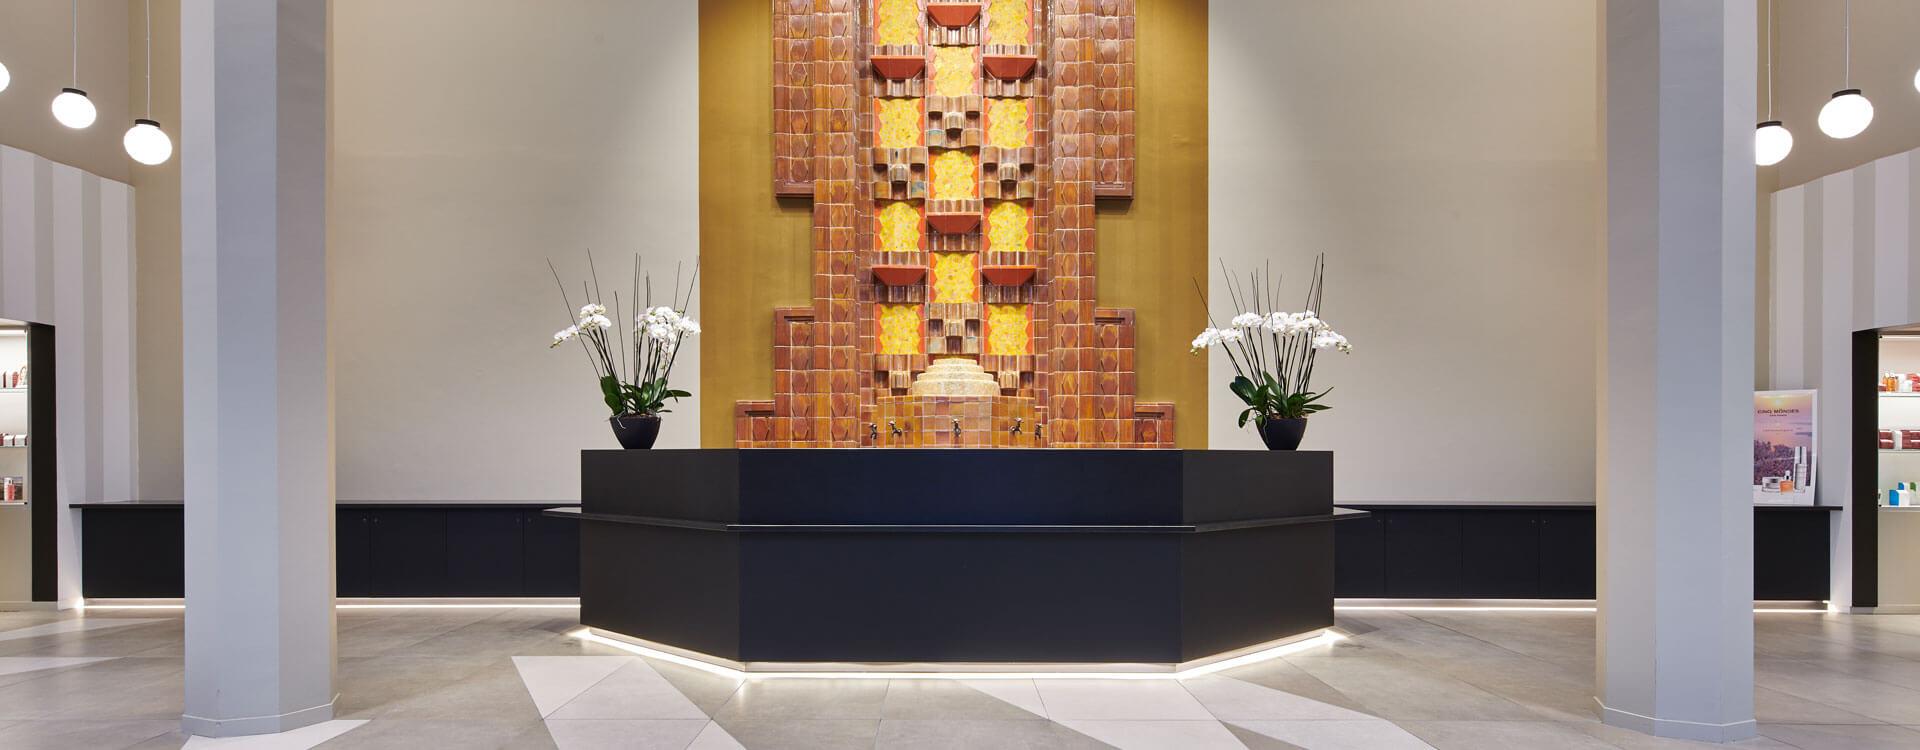 Spa - Hôtel et spa**** Splendid à Dax